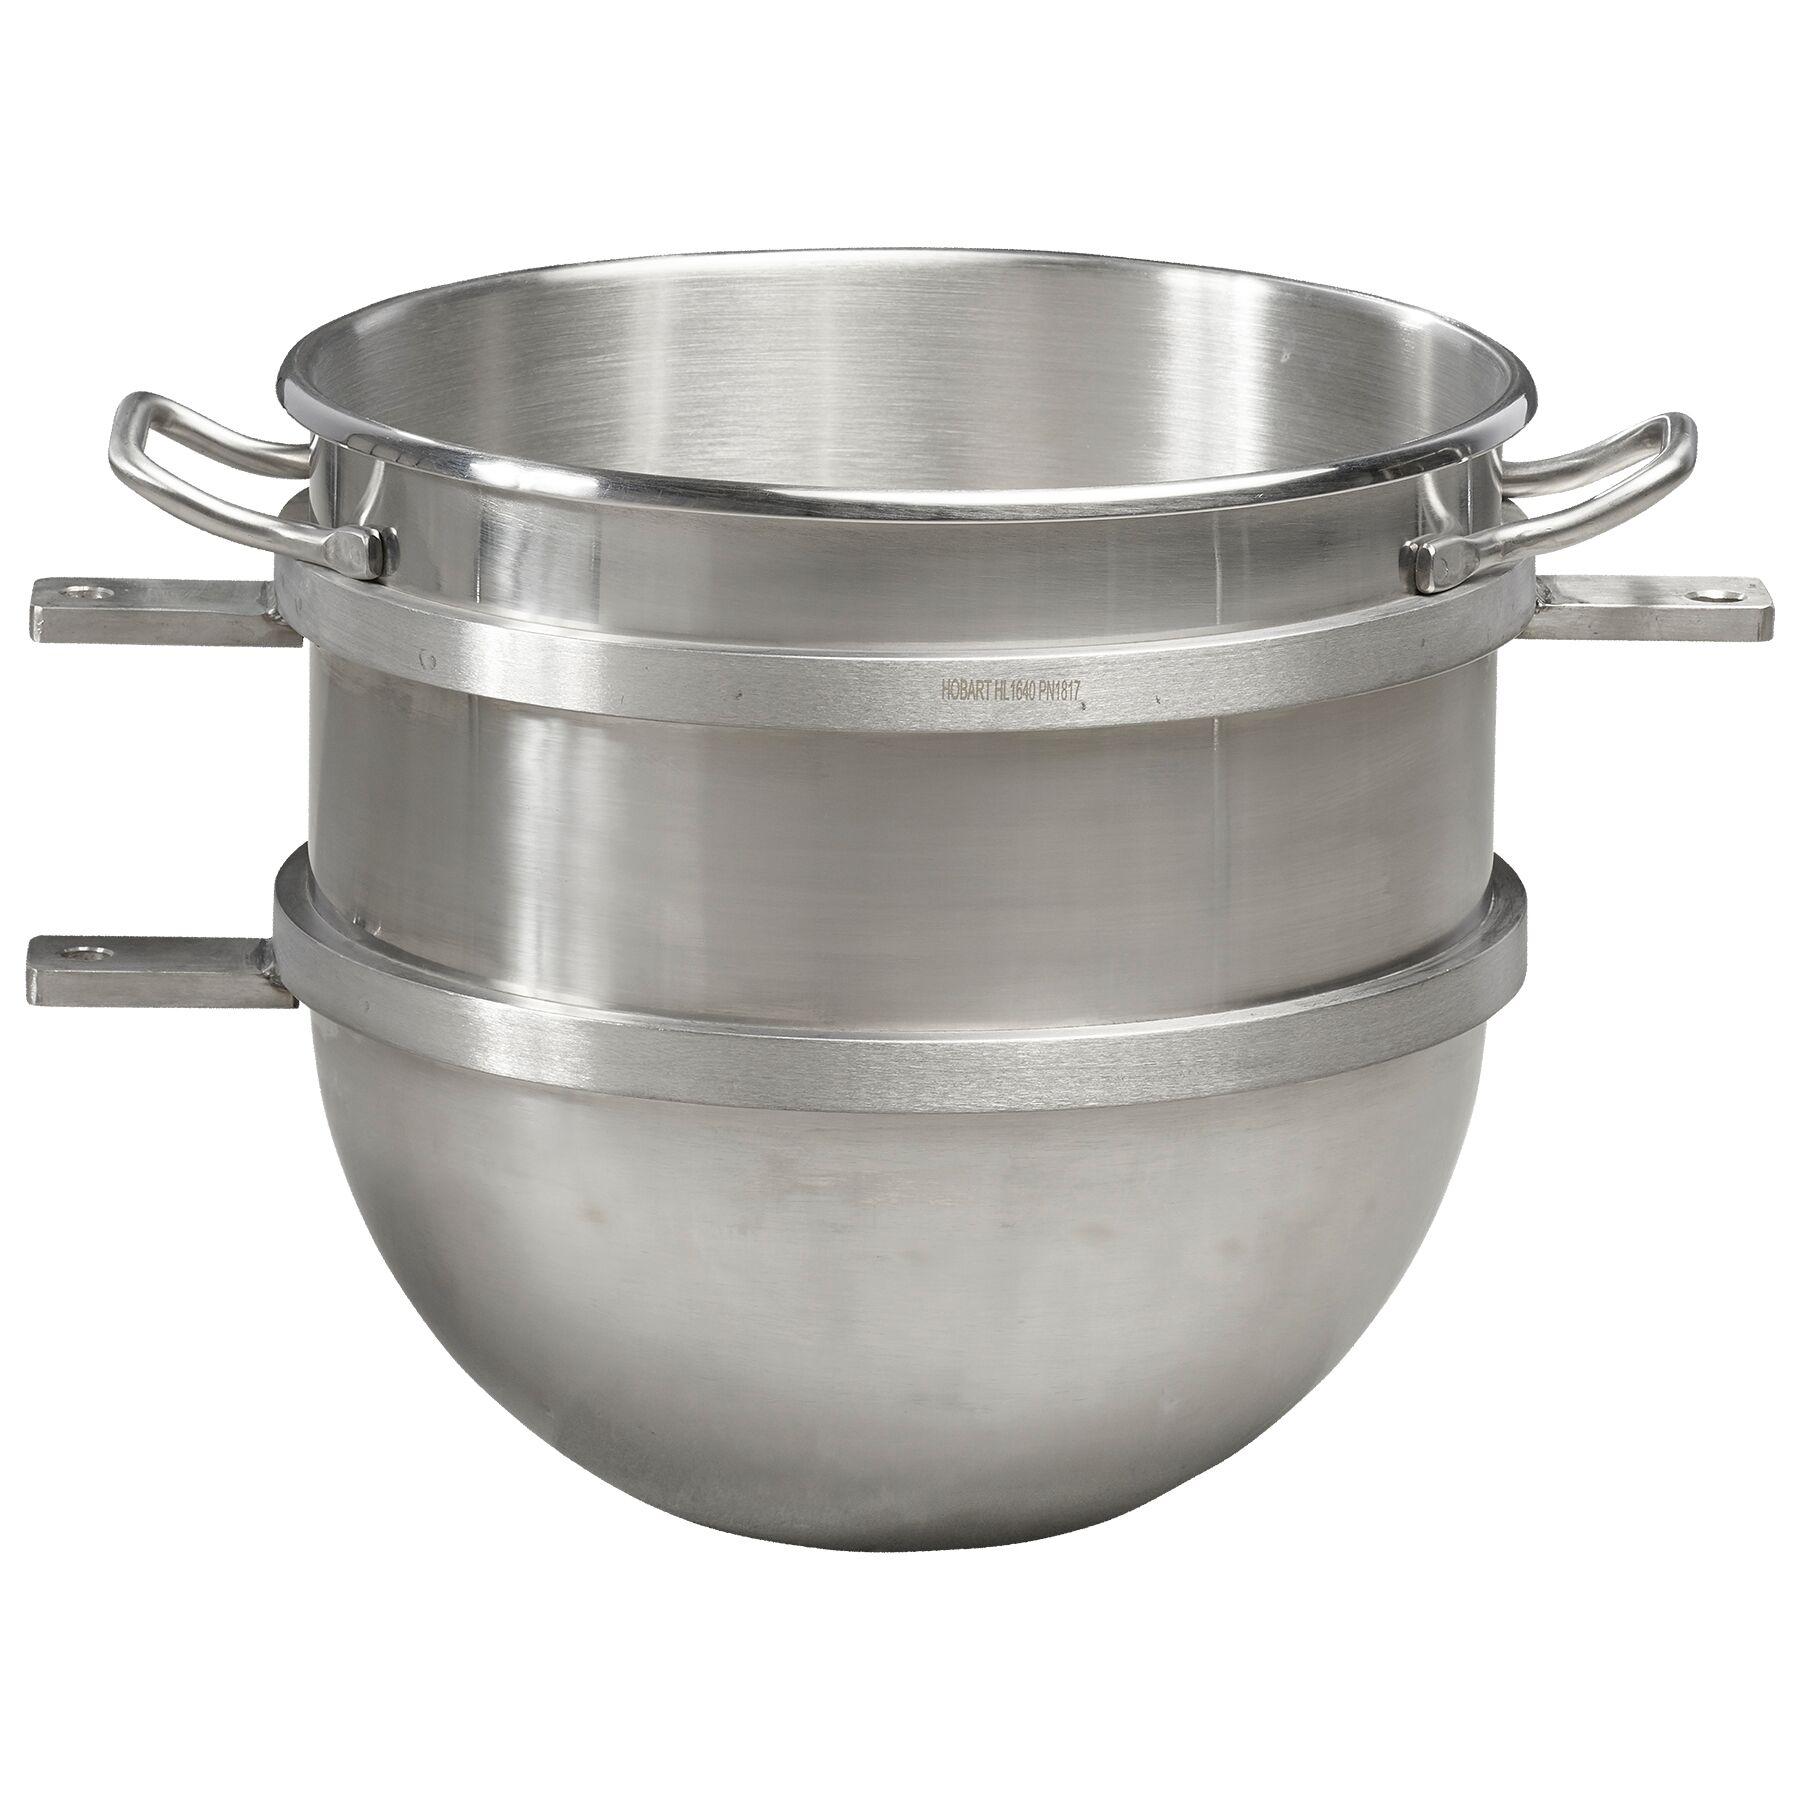 Hobart BOWL-HL640 mixer bowl